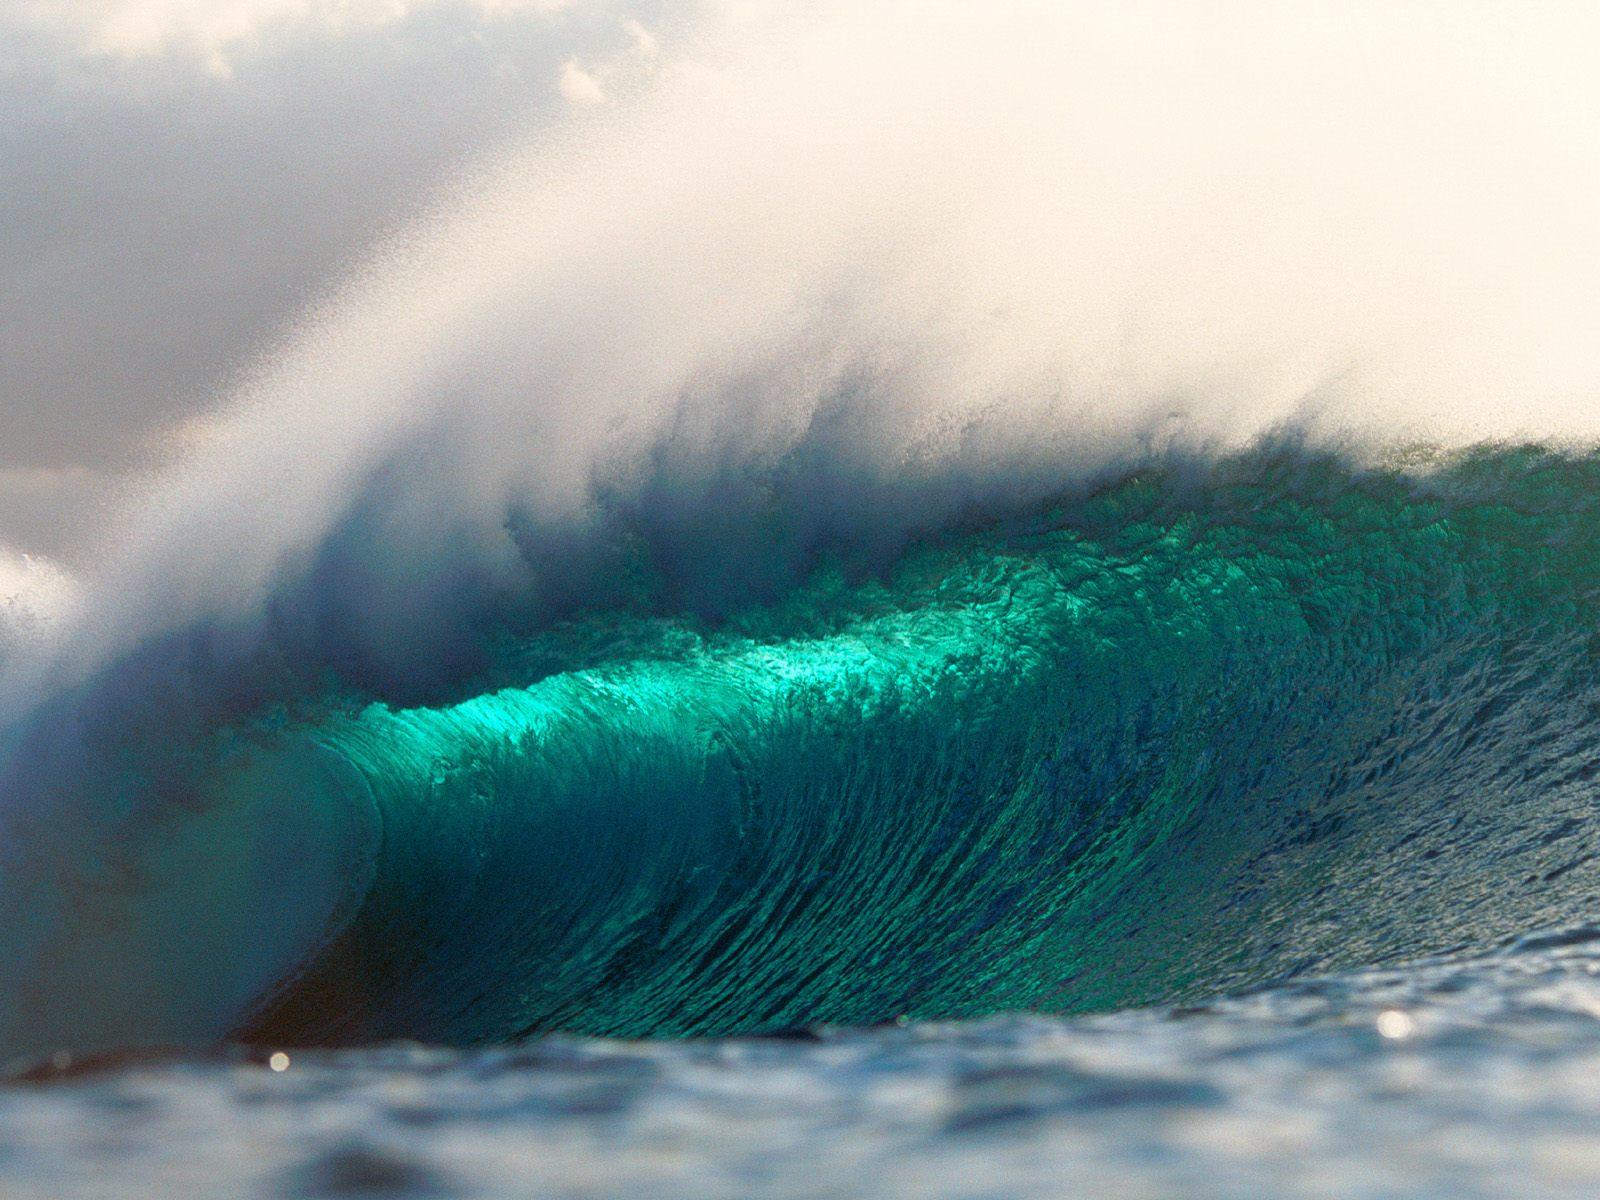 http://3.bp.blogspot.com/_HkbWdsz-H8g/S74FpwpDCJI/AAAAAAAAIlE/D1ERKgHgcqc/s1600/Ocean+Spray,+Hawaii+-+1600x1200+-+ID+45337.jpg